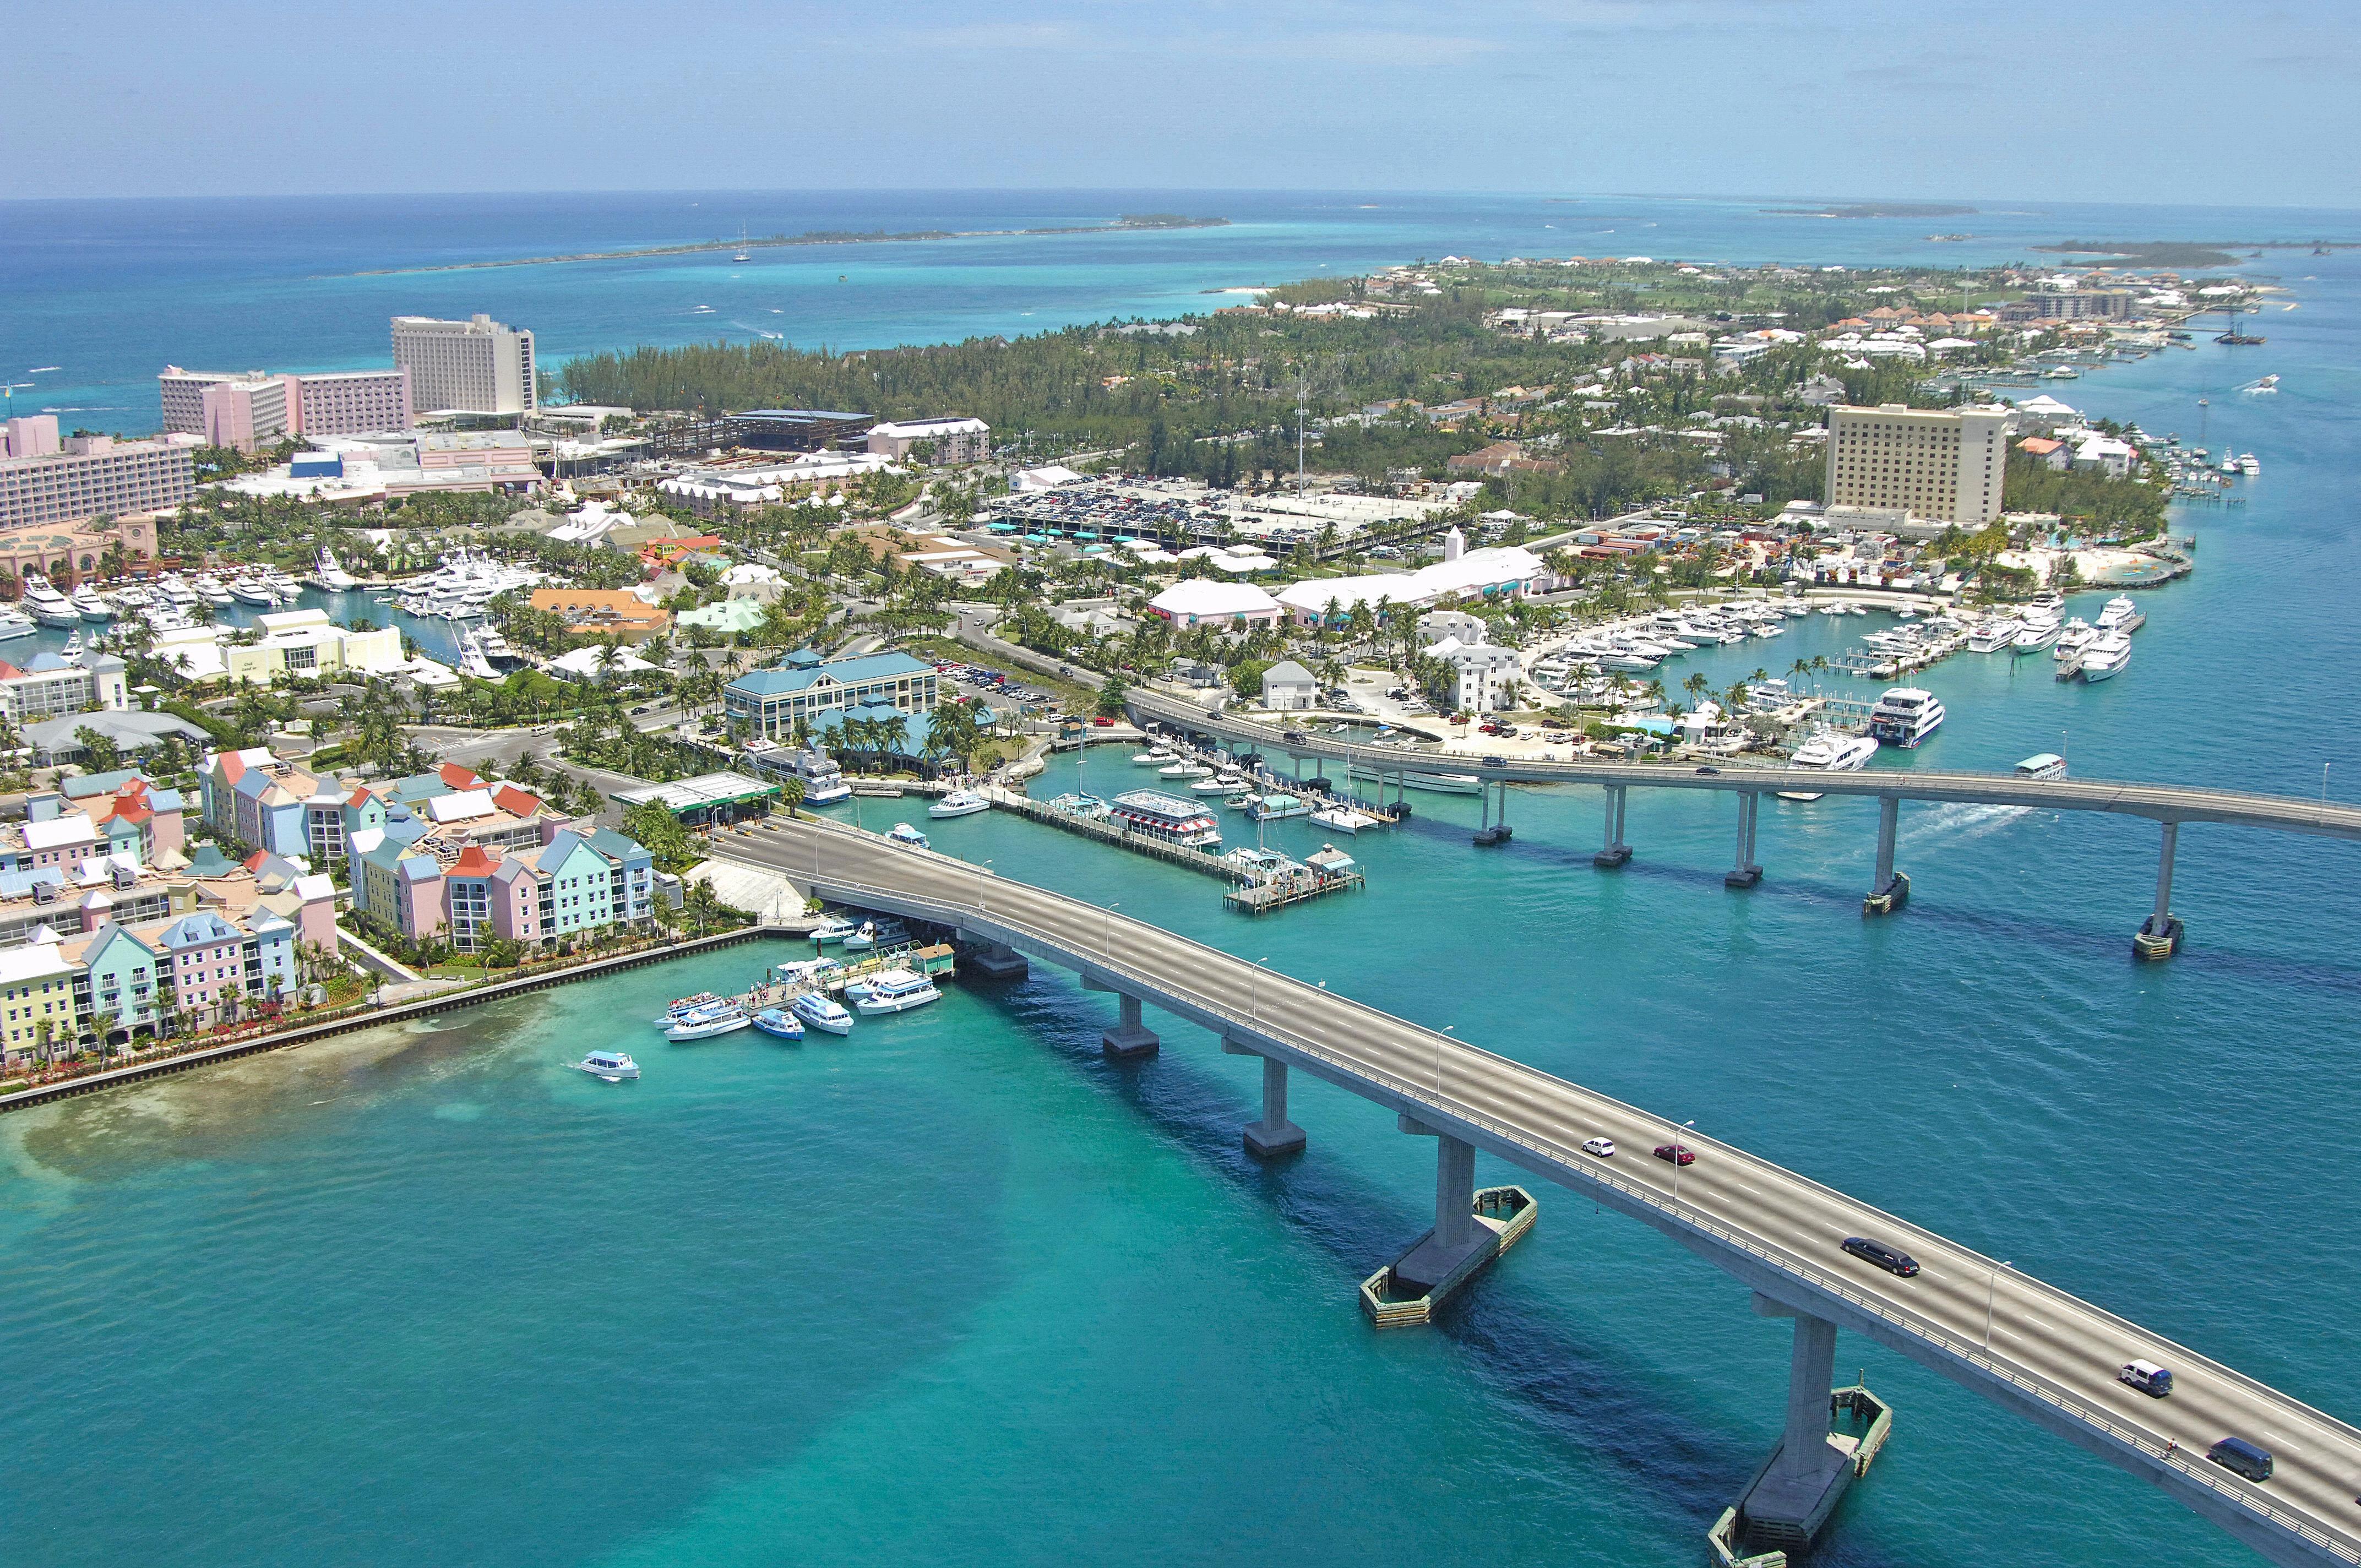 Paradise Island Charter Dock In Paradise Island Bahamas Marina Reviews Phone Number Marinas Com